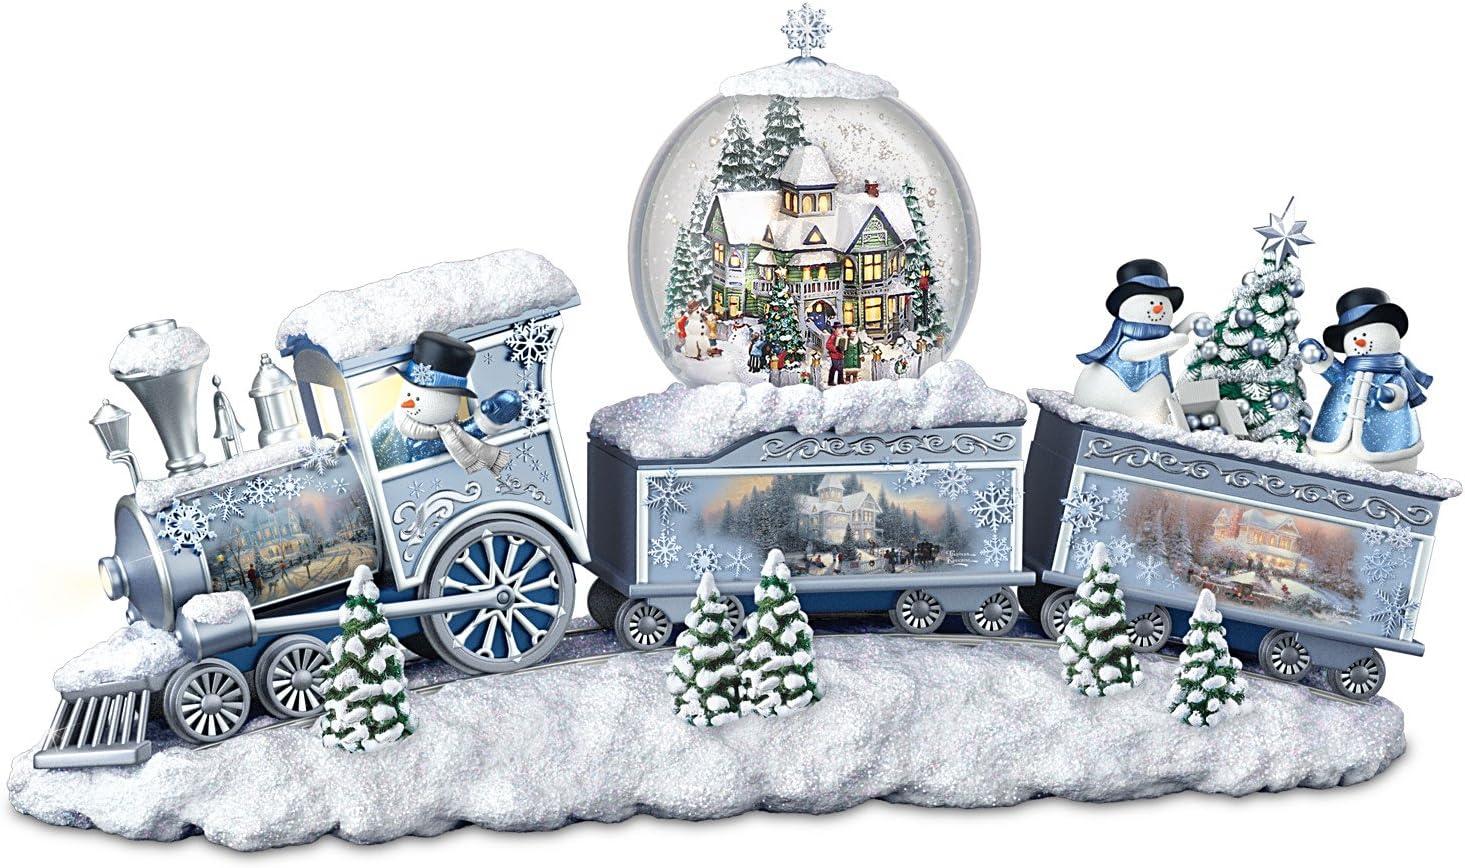 The Bradford Exchange Thomas Kinkade Snowfall Express Light Up Musical Snowman Snowglobe Train